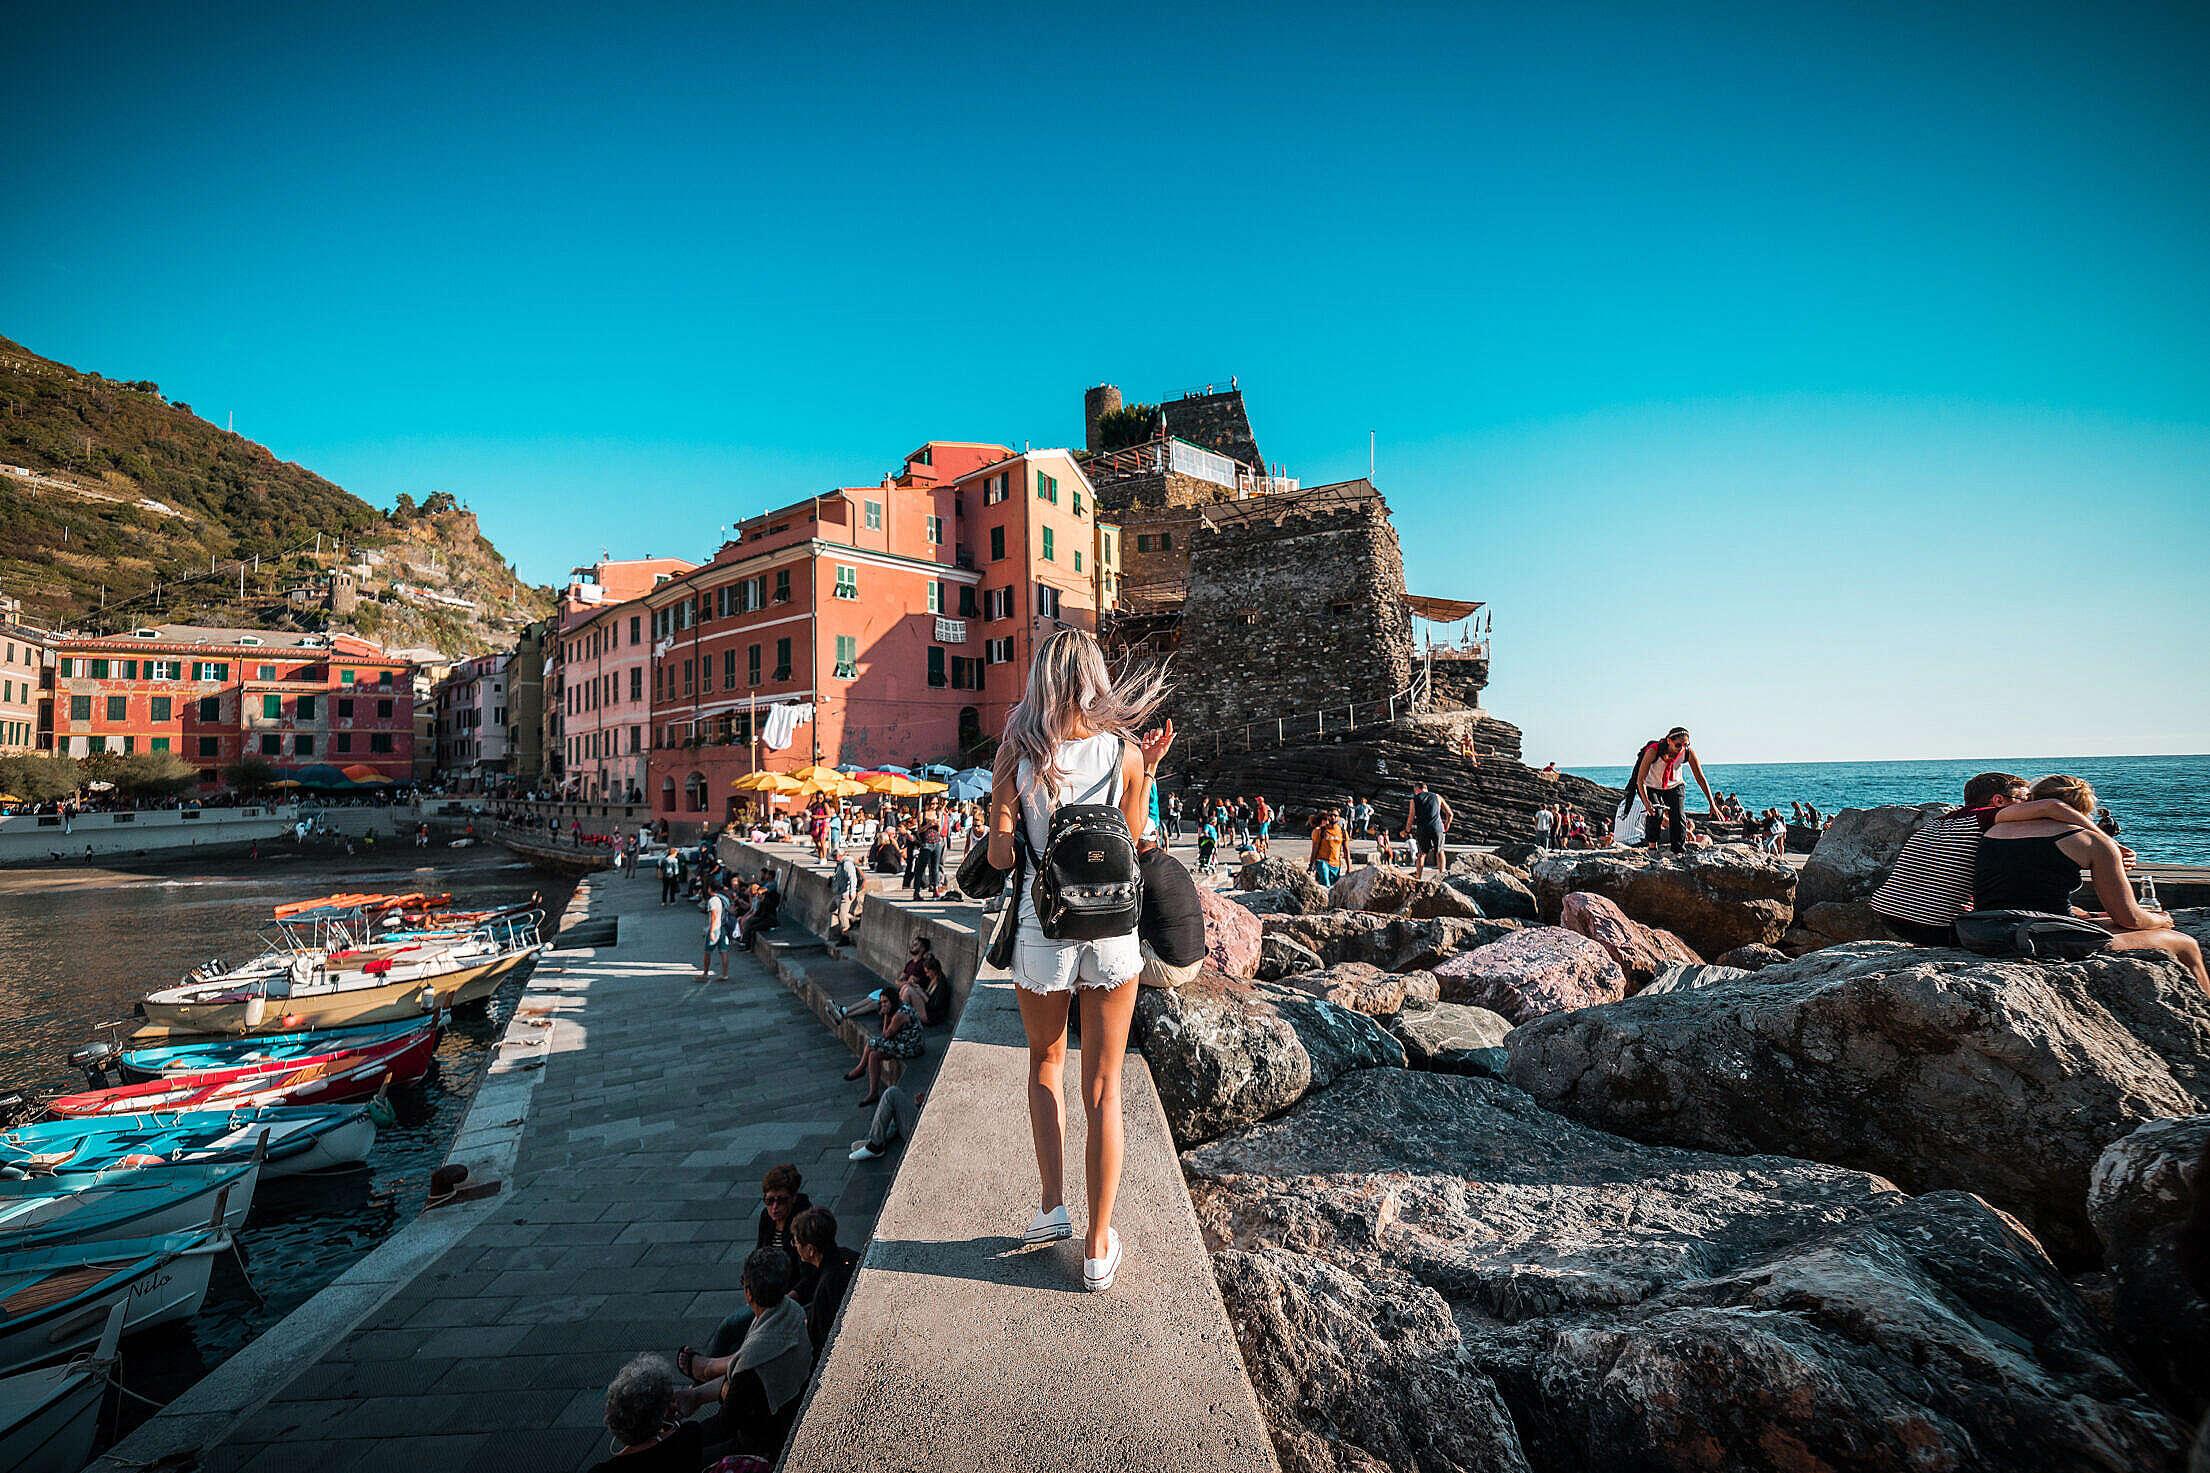 Vernazza in Italy, Cinque Terre Free Stock Photo